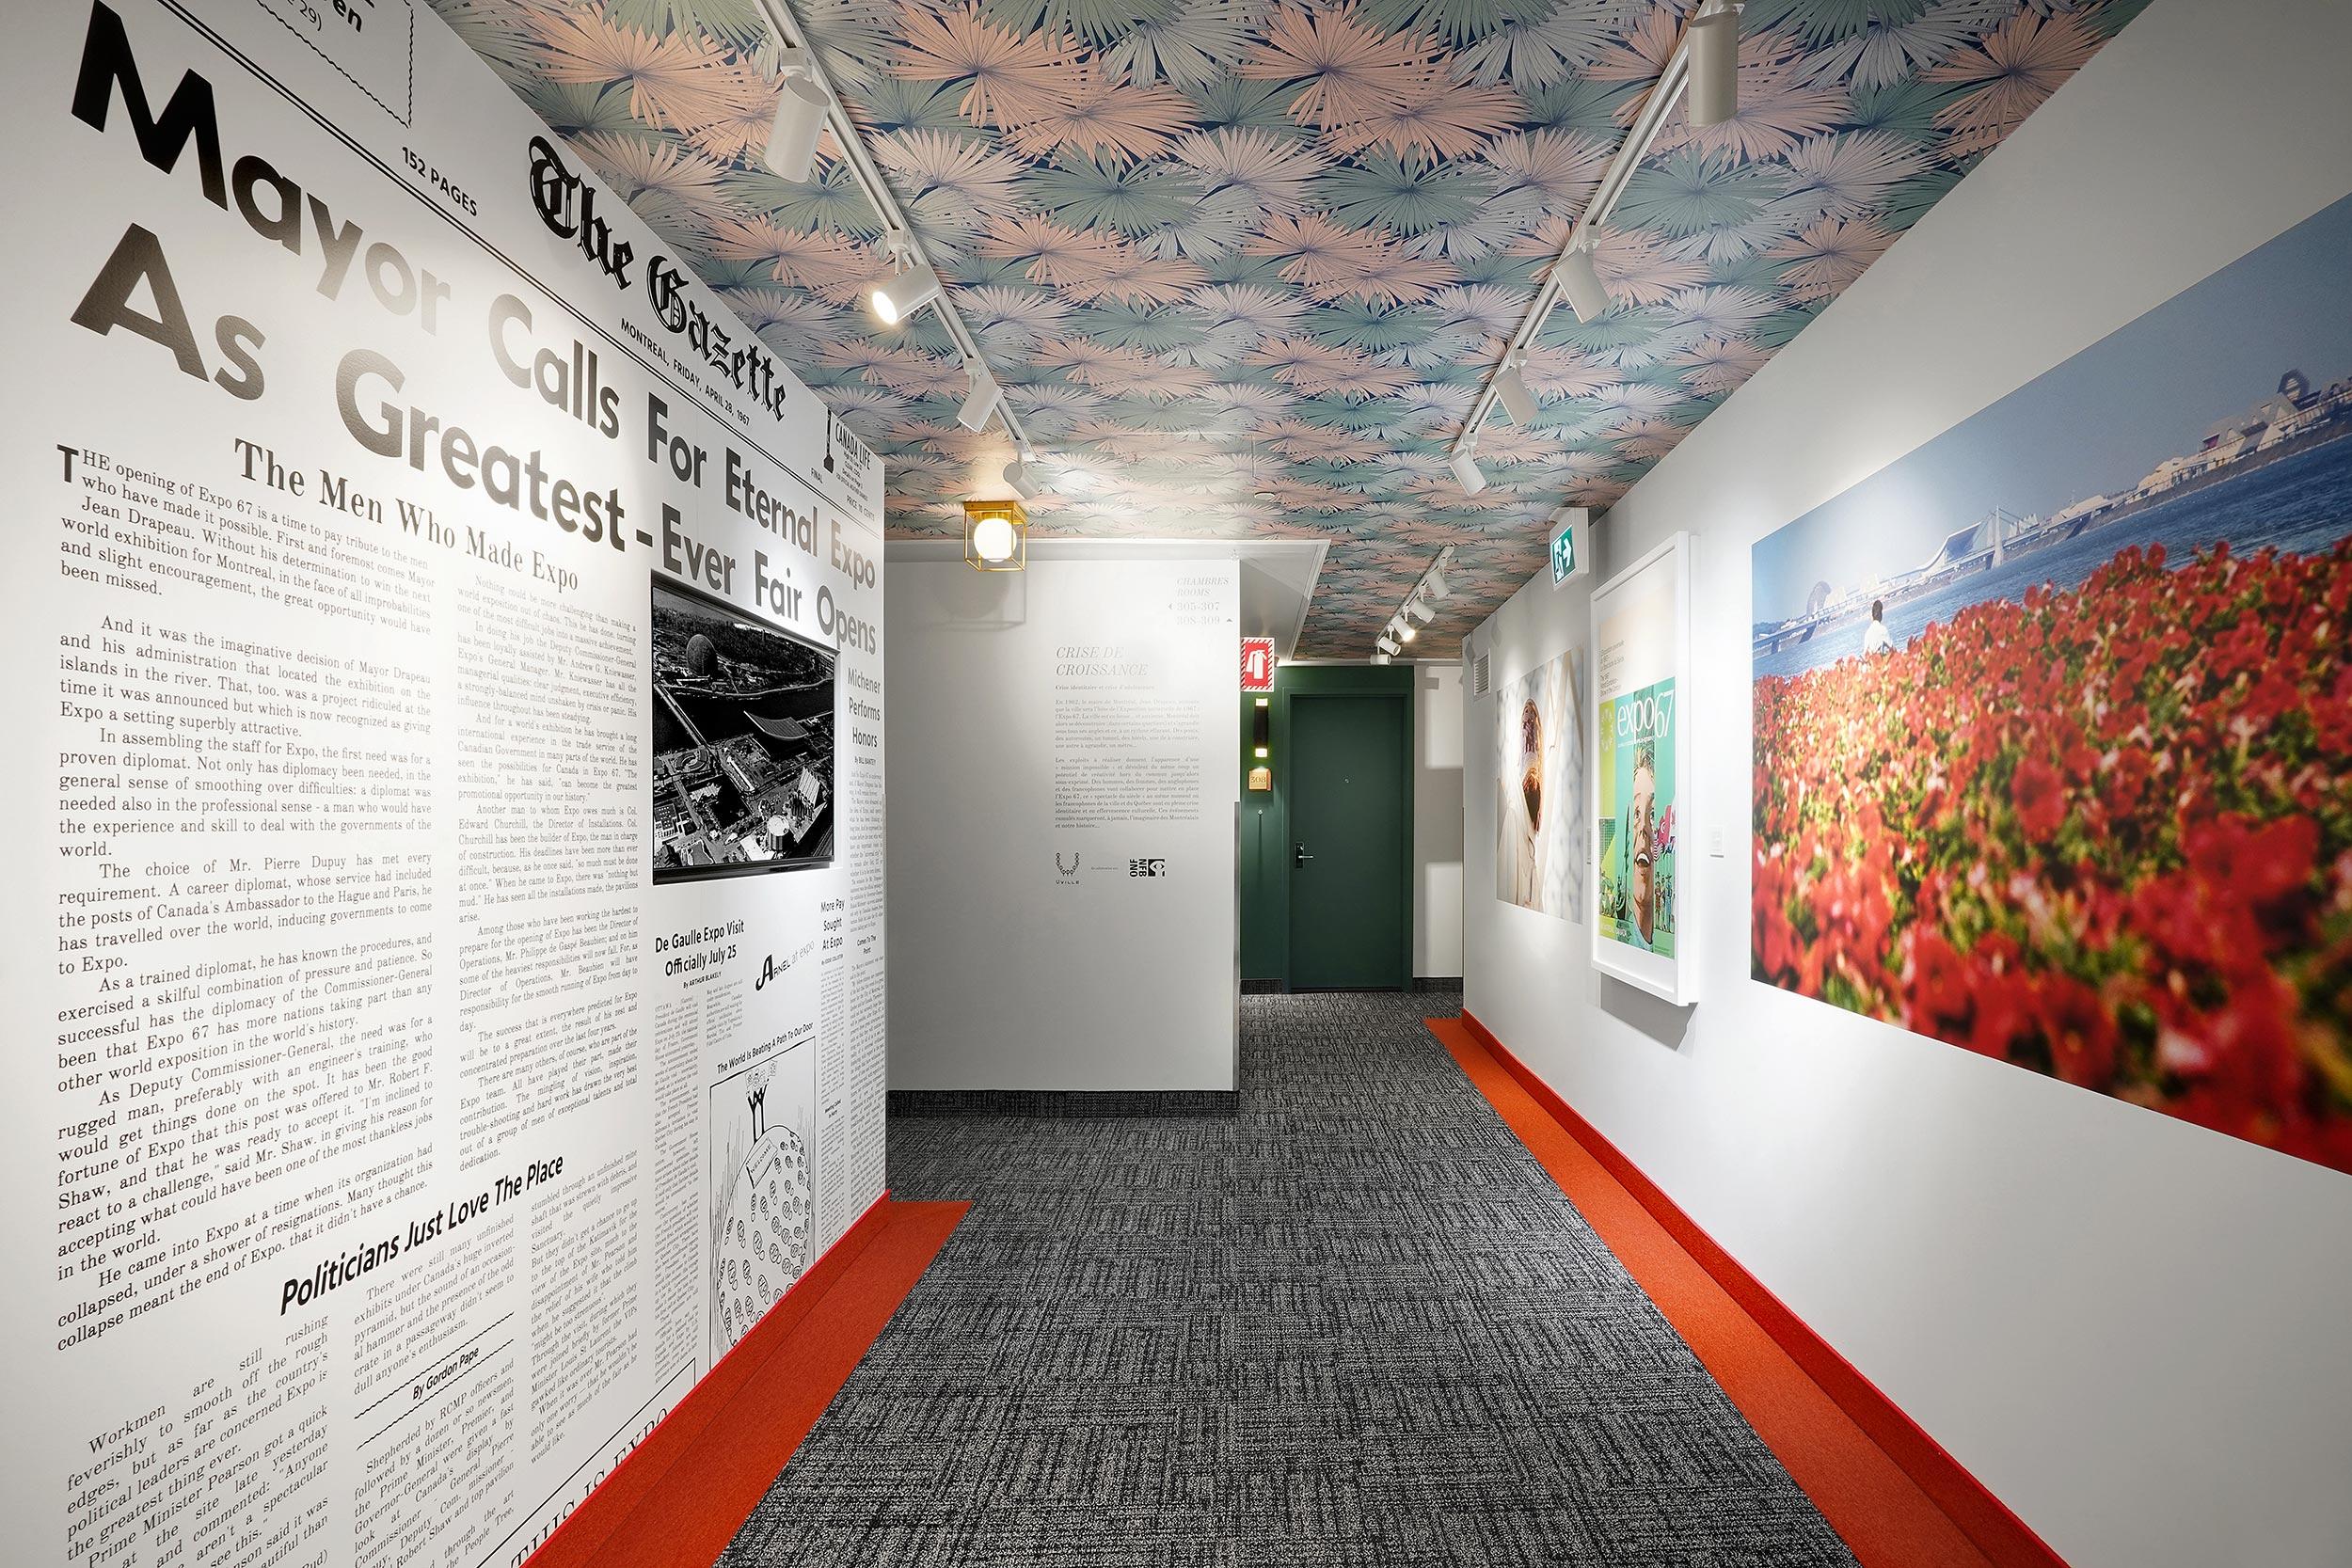 Le Hall musée